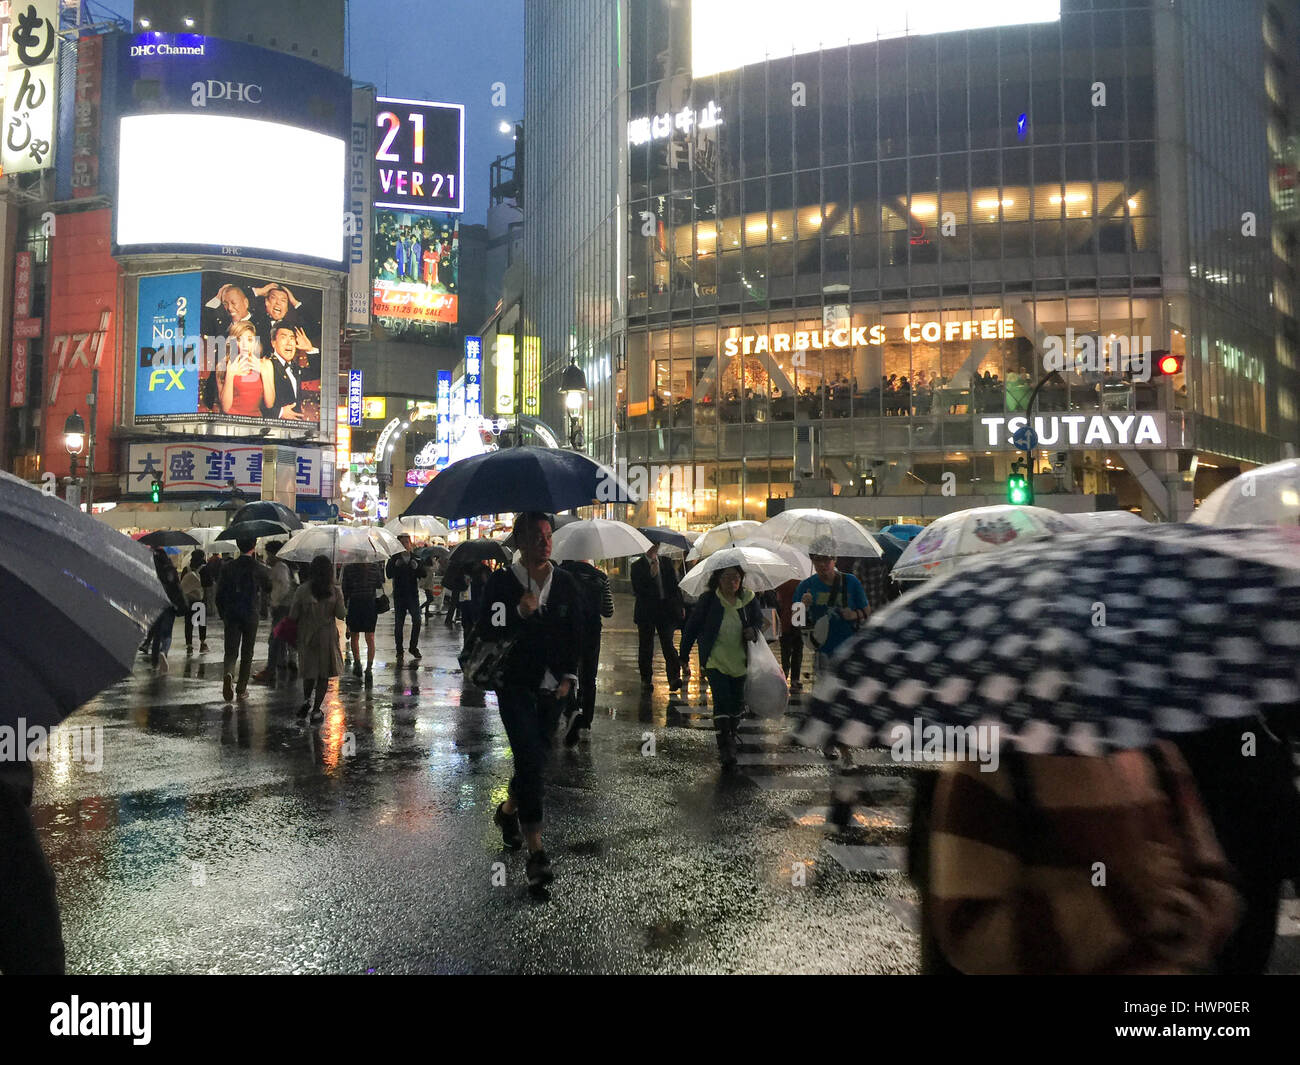 TOKYO - NOVEMBER 18, 2015: Pedestrians walk across the Shibuya junction on a rainy day on November 18, 2015 in Tokyo, Stock Photo